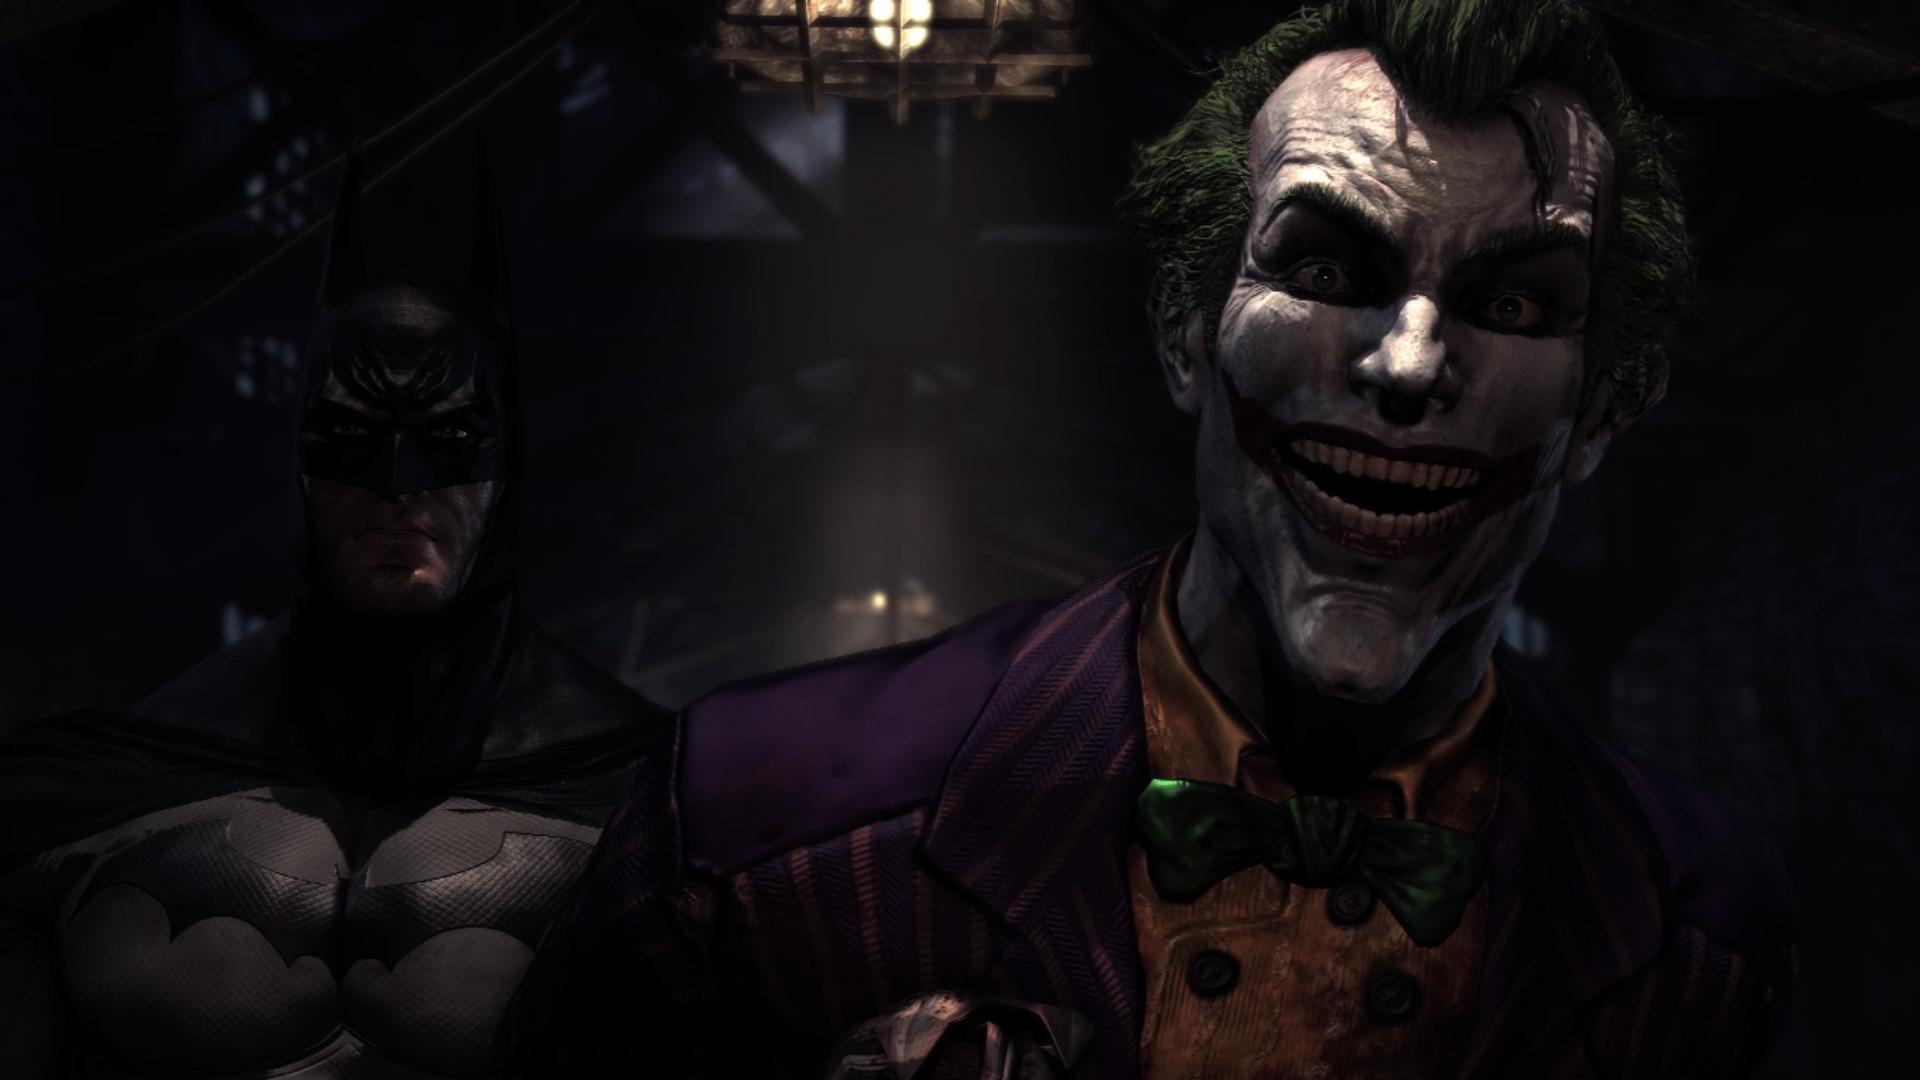 The Joker And Batman Wallpapers HD Wallpaper Movies Wallpapers 1920x1080